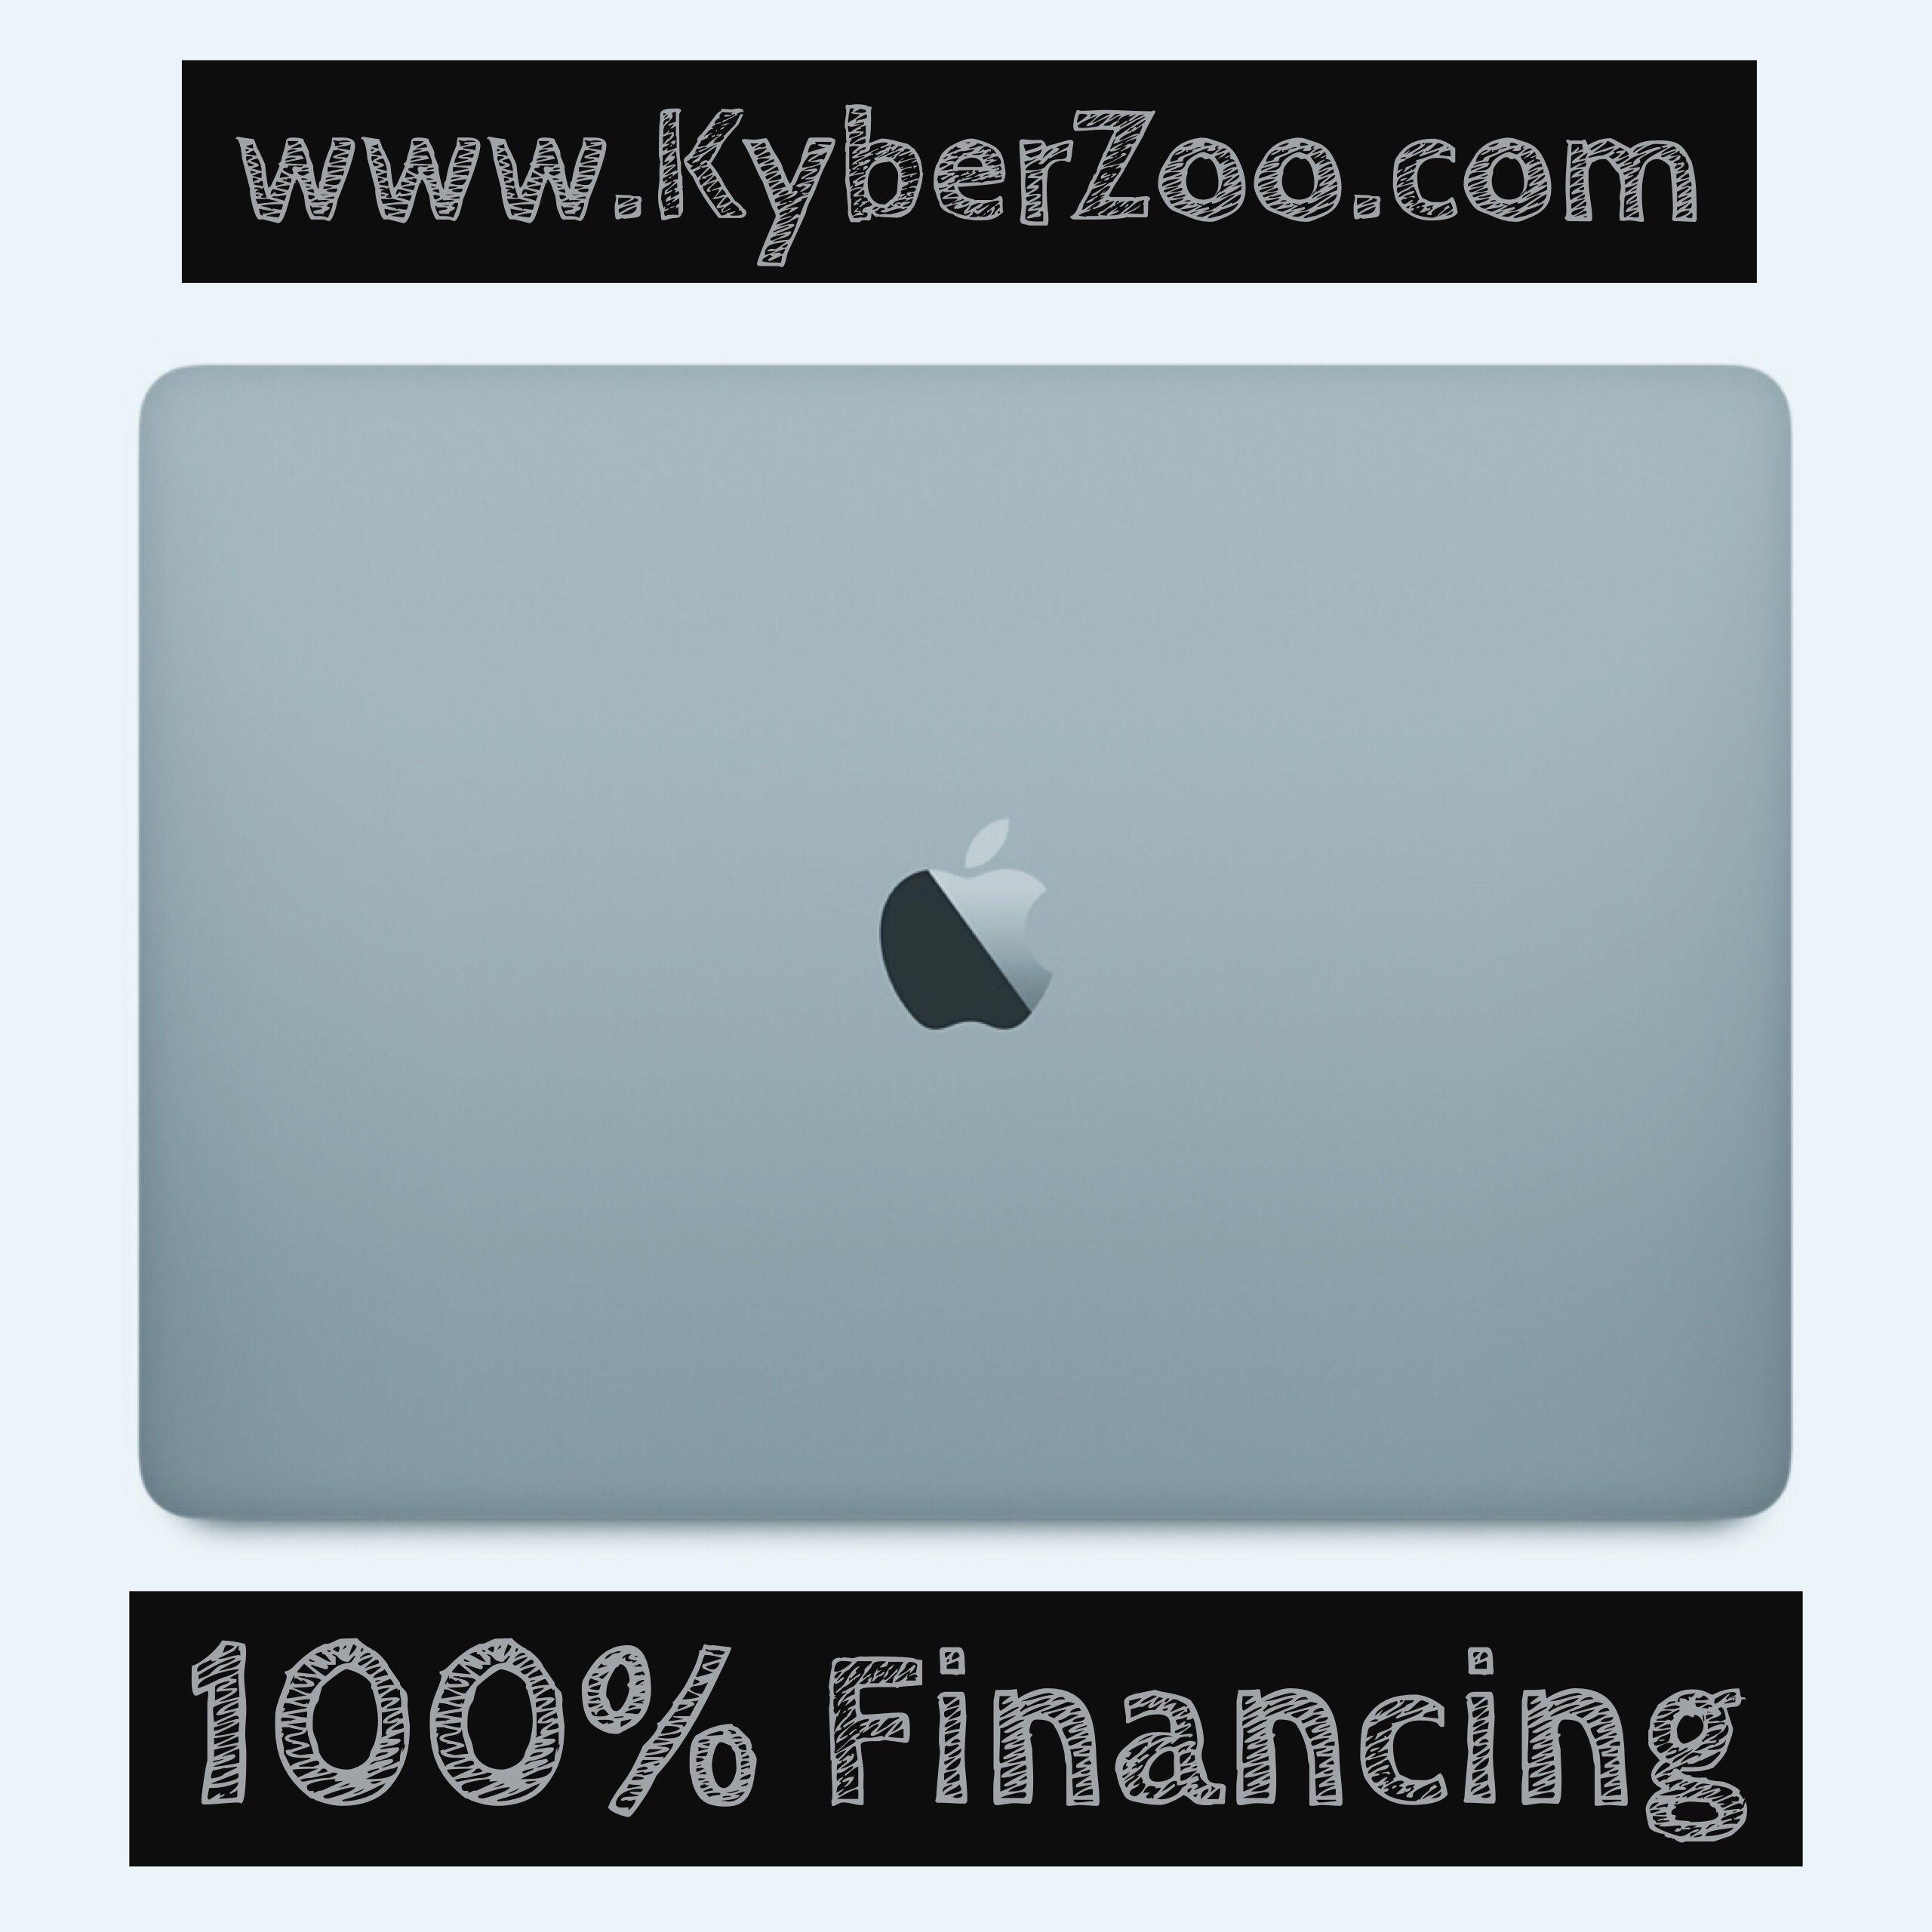 Kyberzoo Shoptilyoudrop Megasmartsuperstore Finance 100